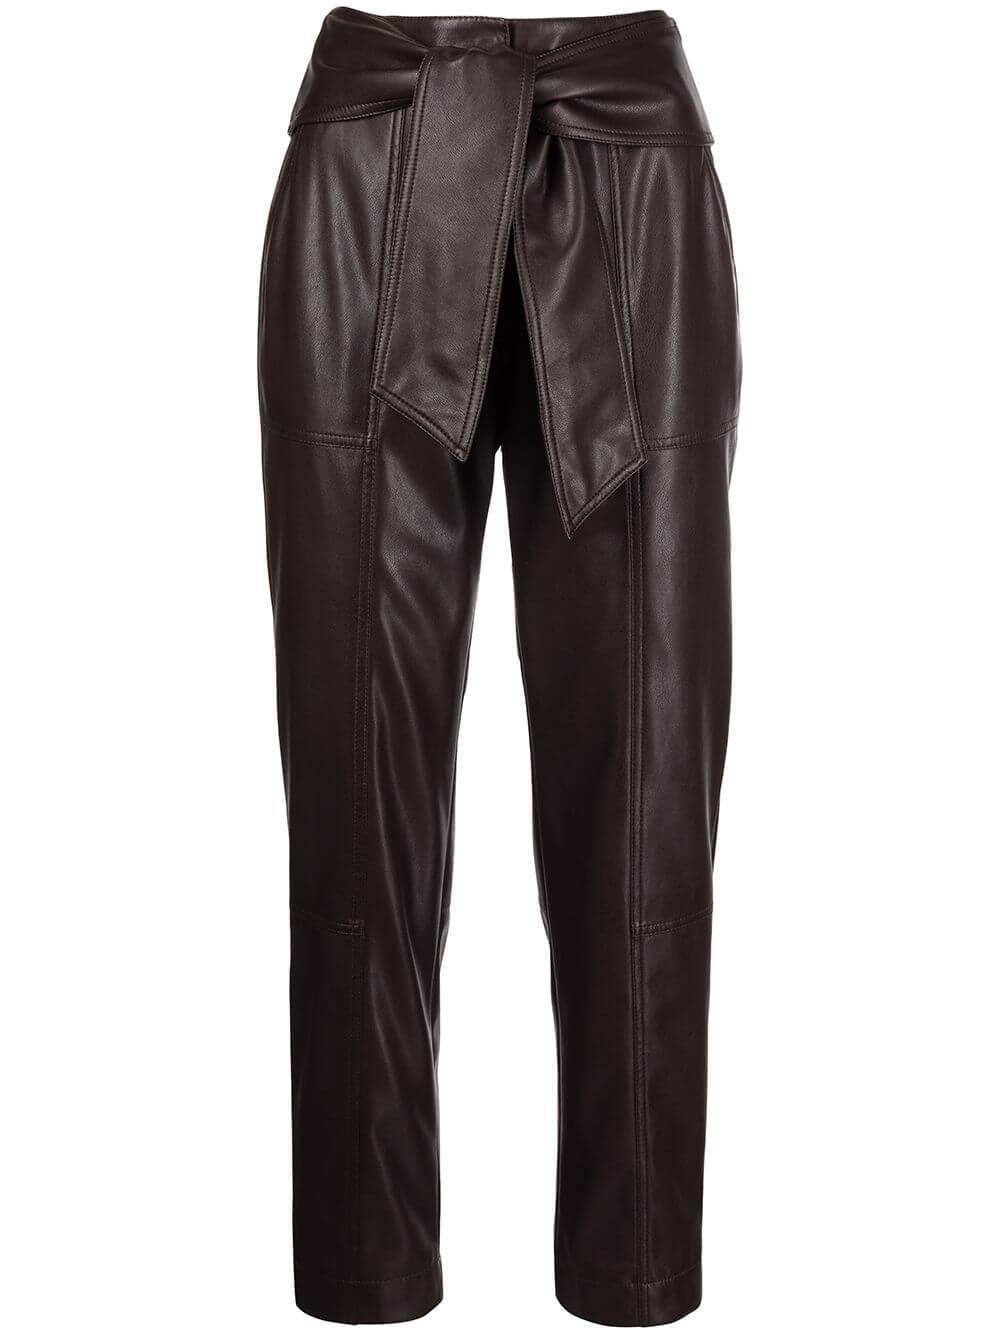 Tessa Vegan Leather Tie Waist Pants Item # 521-4046-L